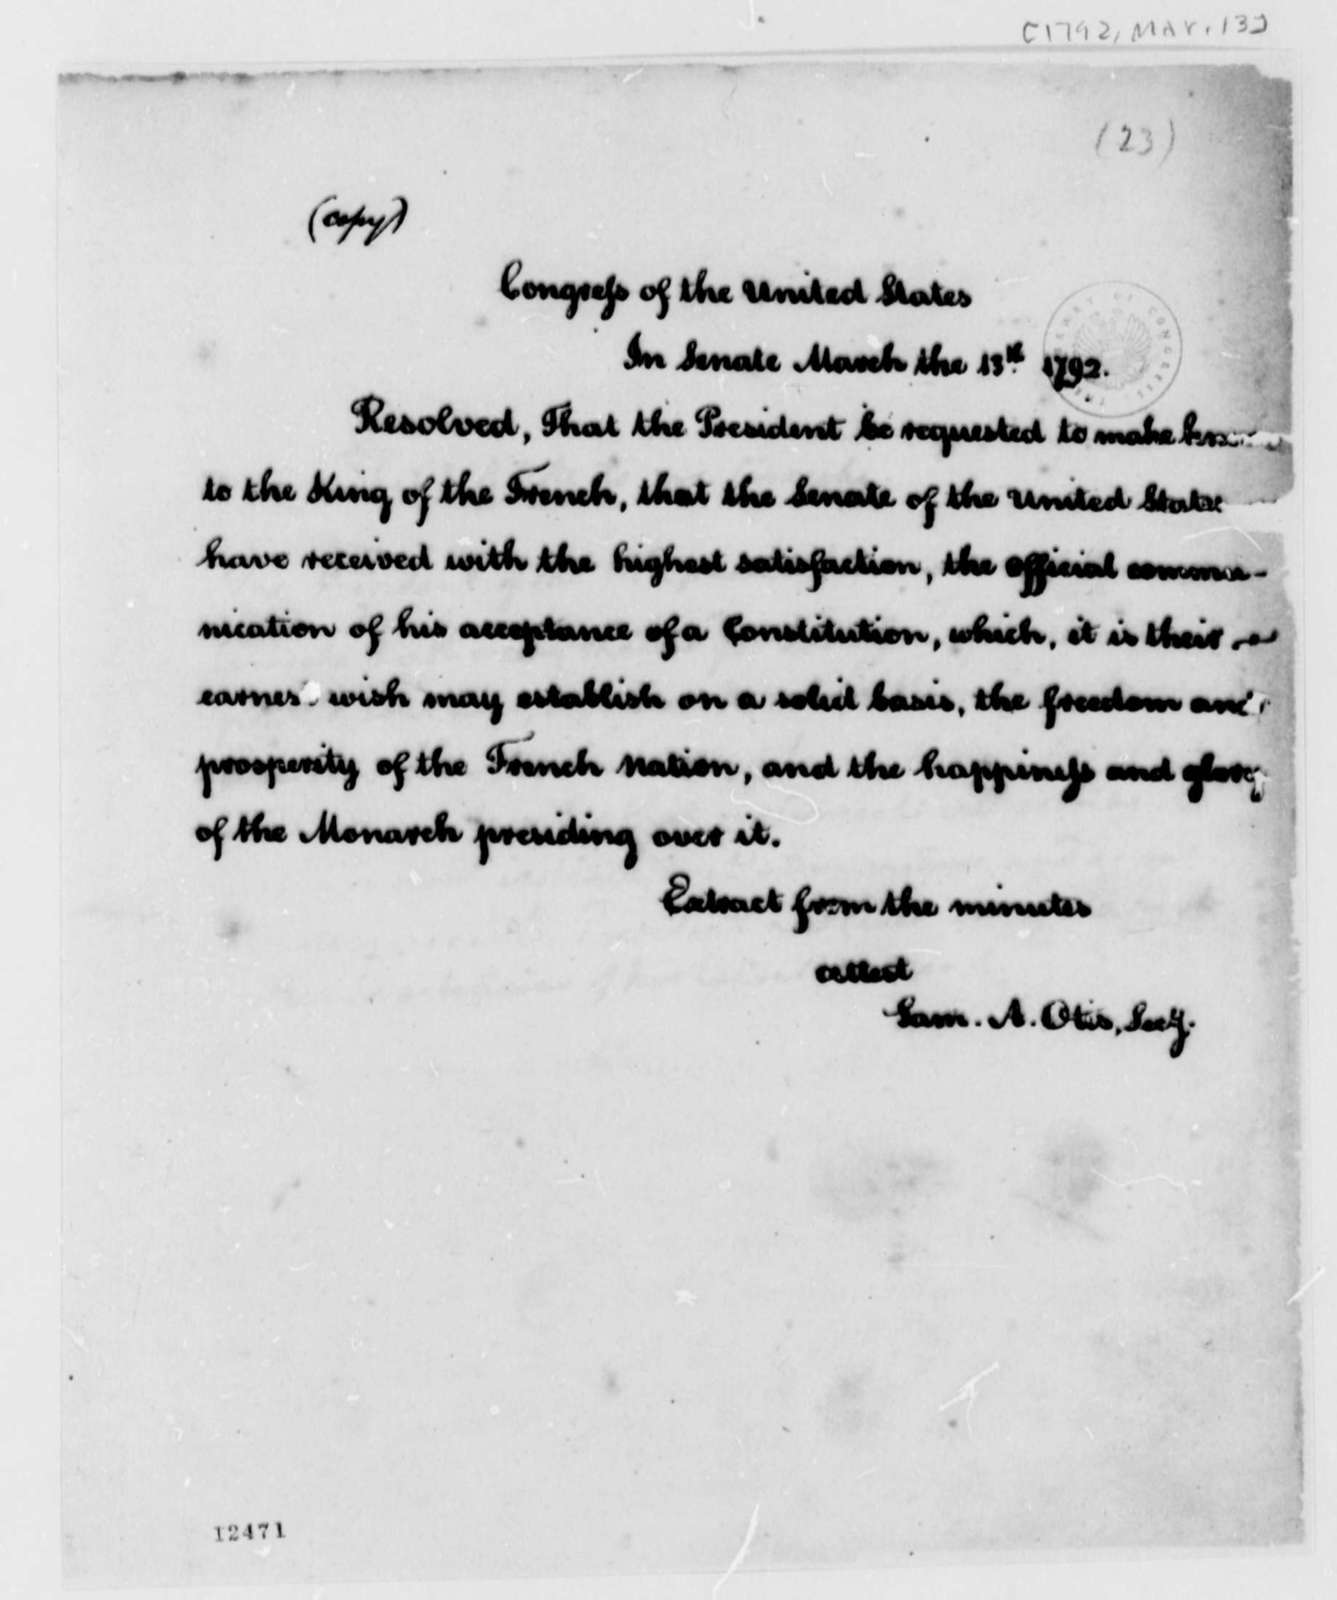 Senate Louis XVI of France, March 14, 1792, Constitution